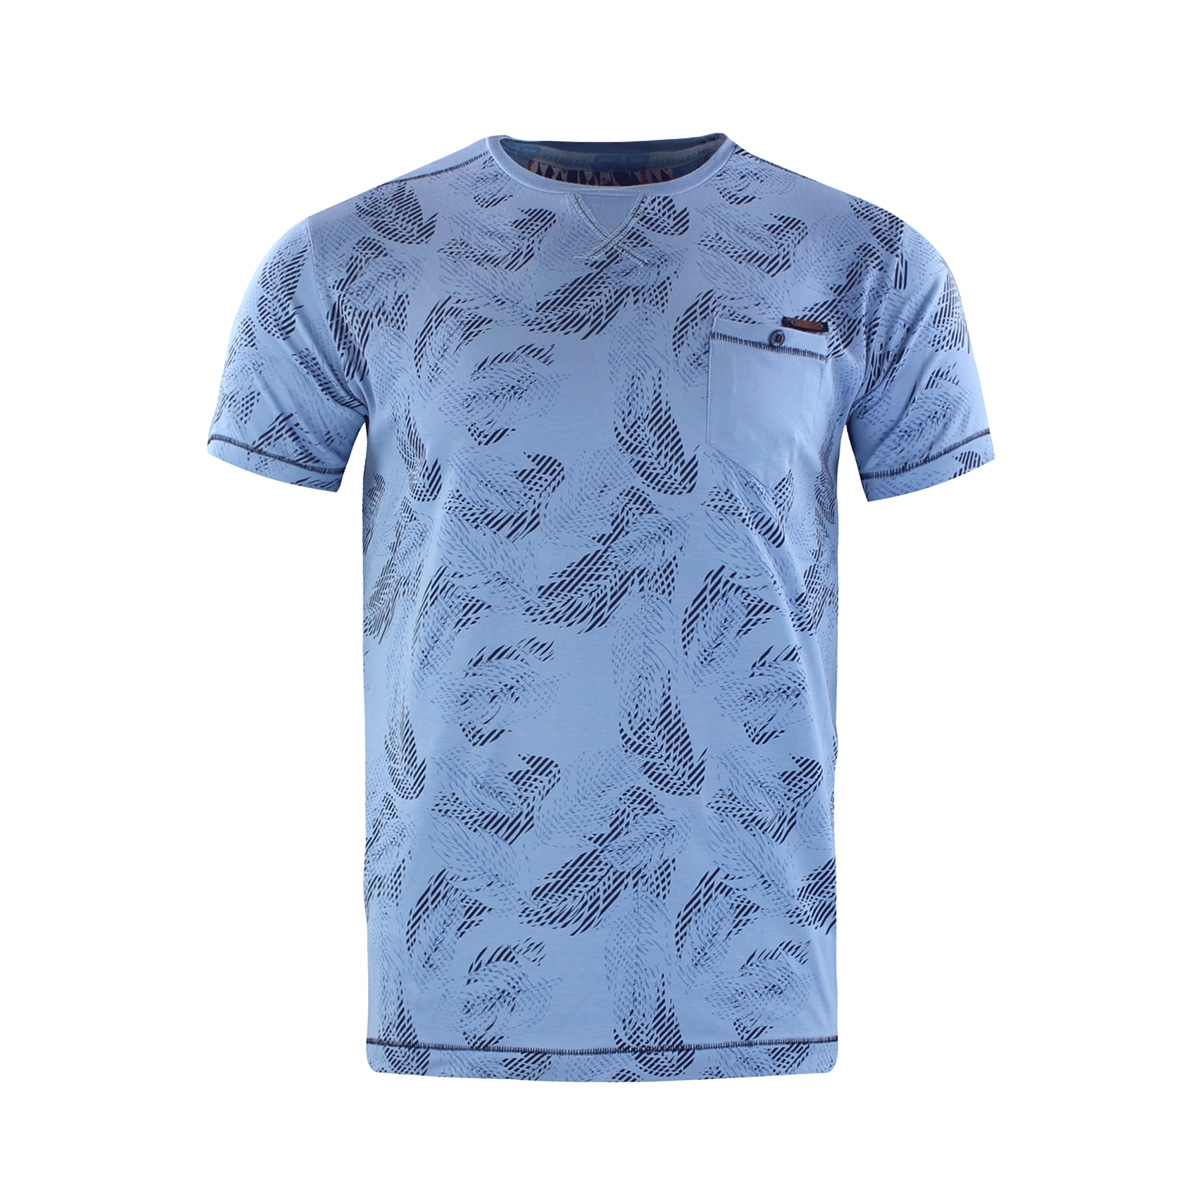 t shirt 15175 gabbiano t-shirt blue